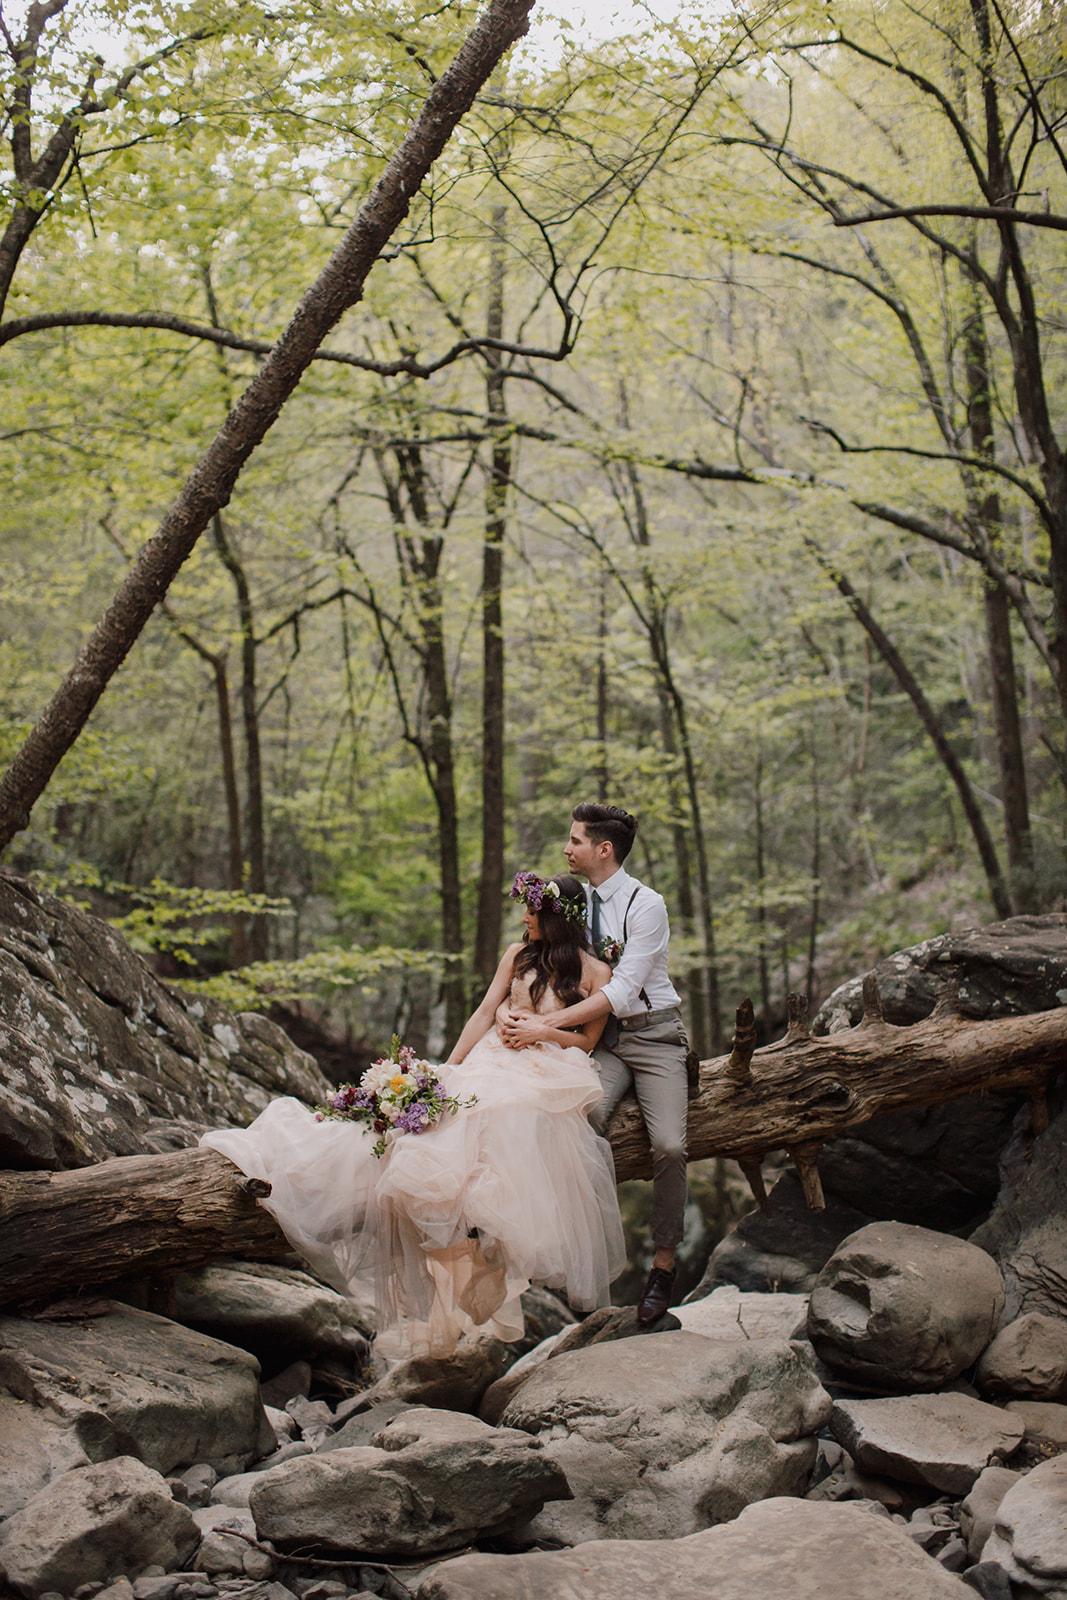 Lush bridal bouquet with lilac, peonies, cafe au lait dahlias, and butterfly ranunculus // Nashville Ozone Falls Wedding Floral Design